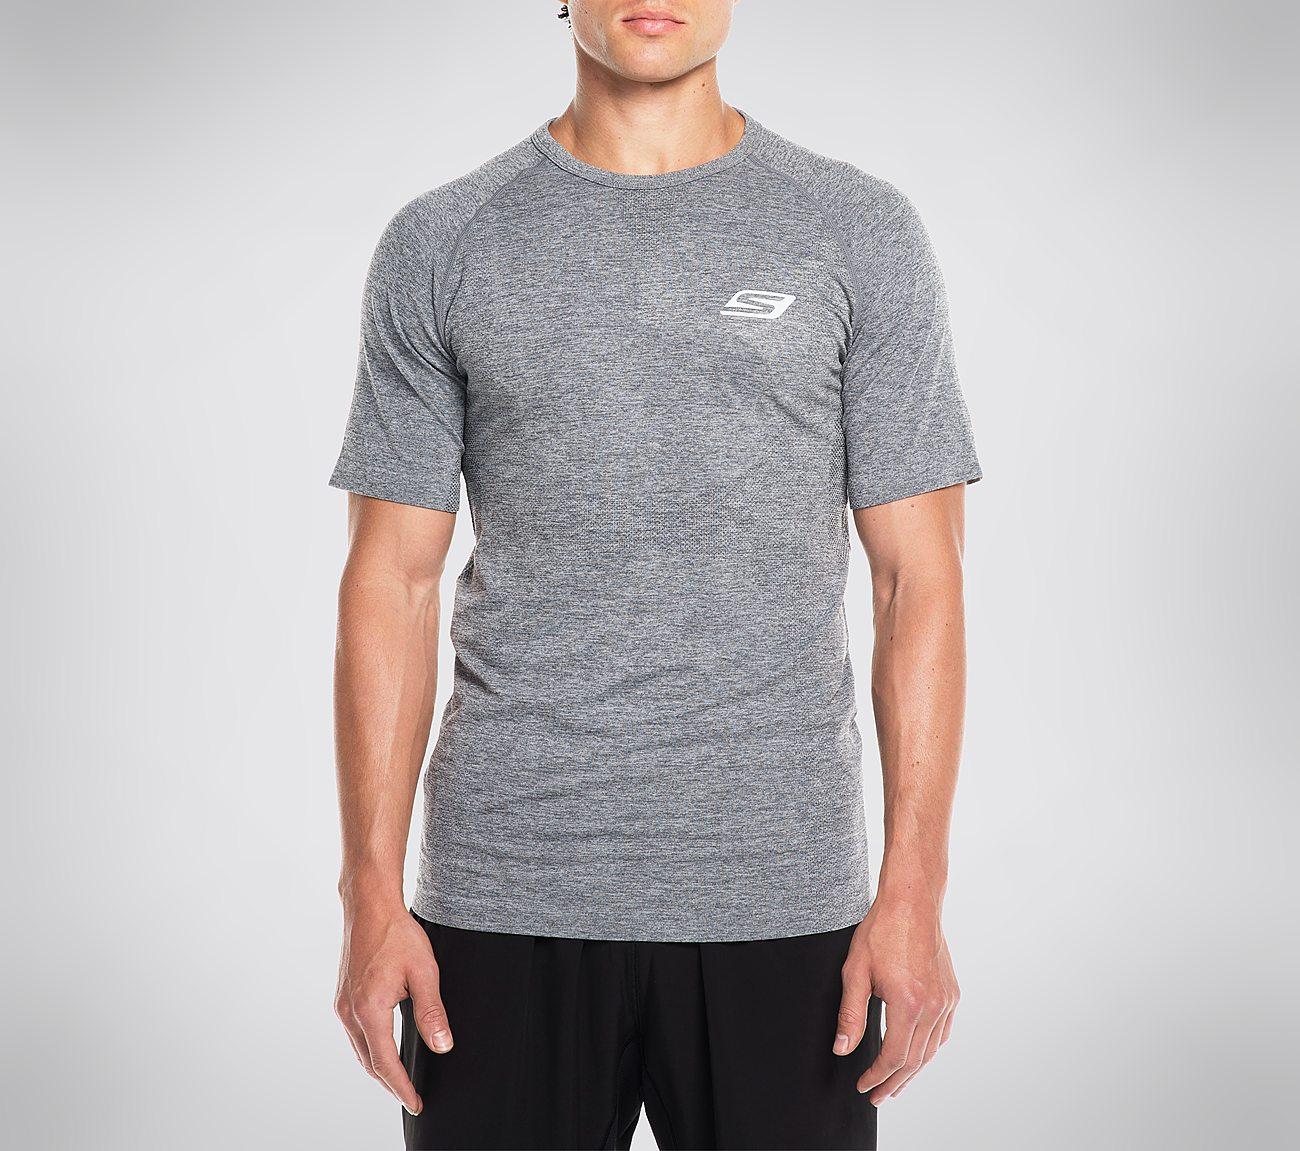 GOdri Seamless Short Sleeve Tee Shirt